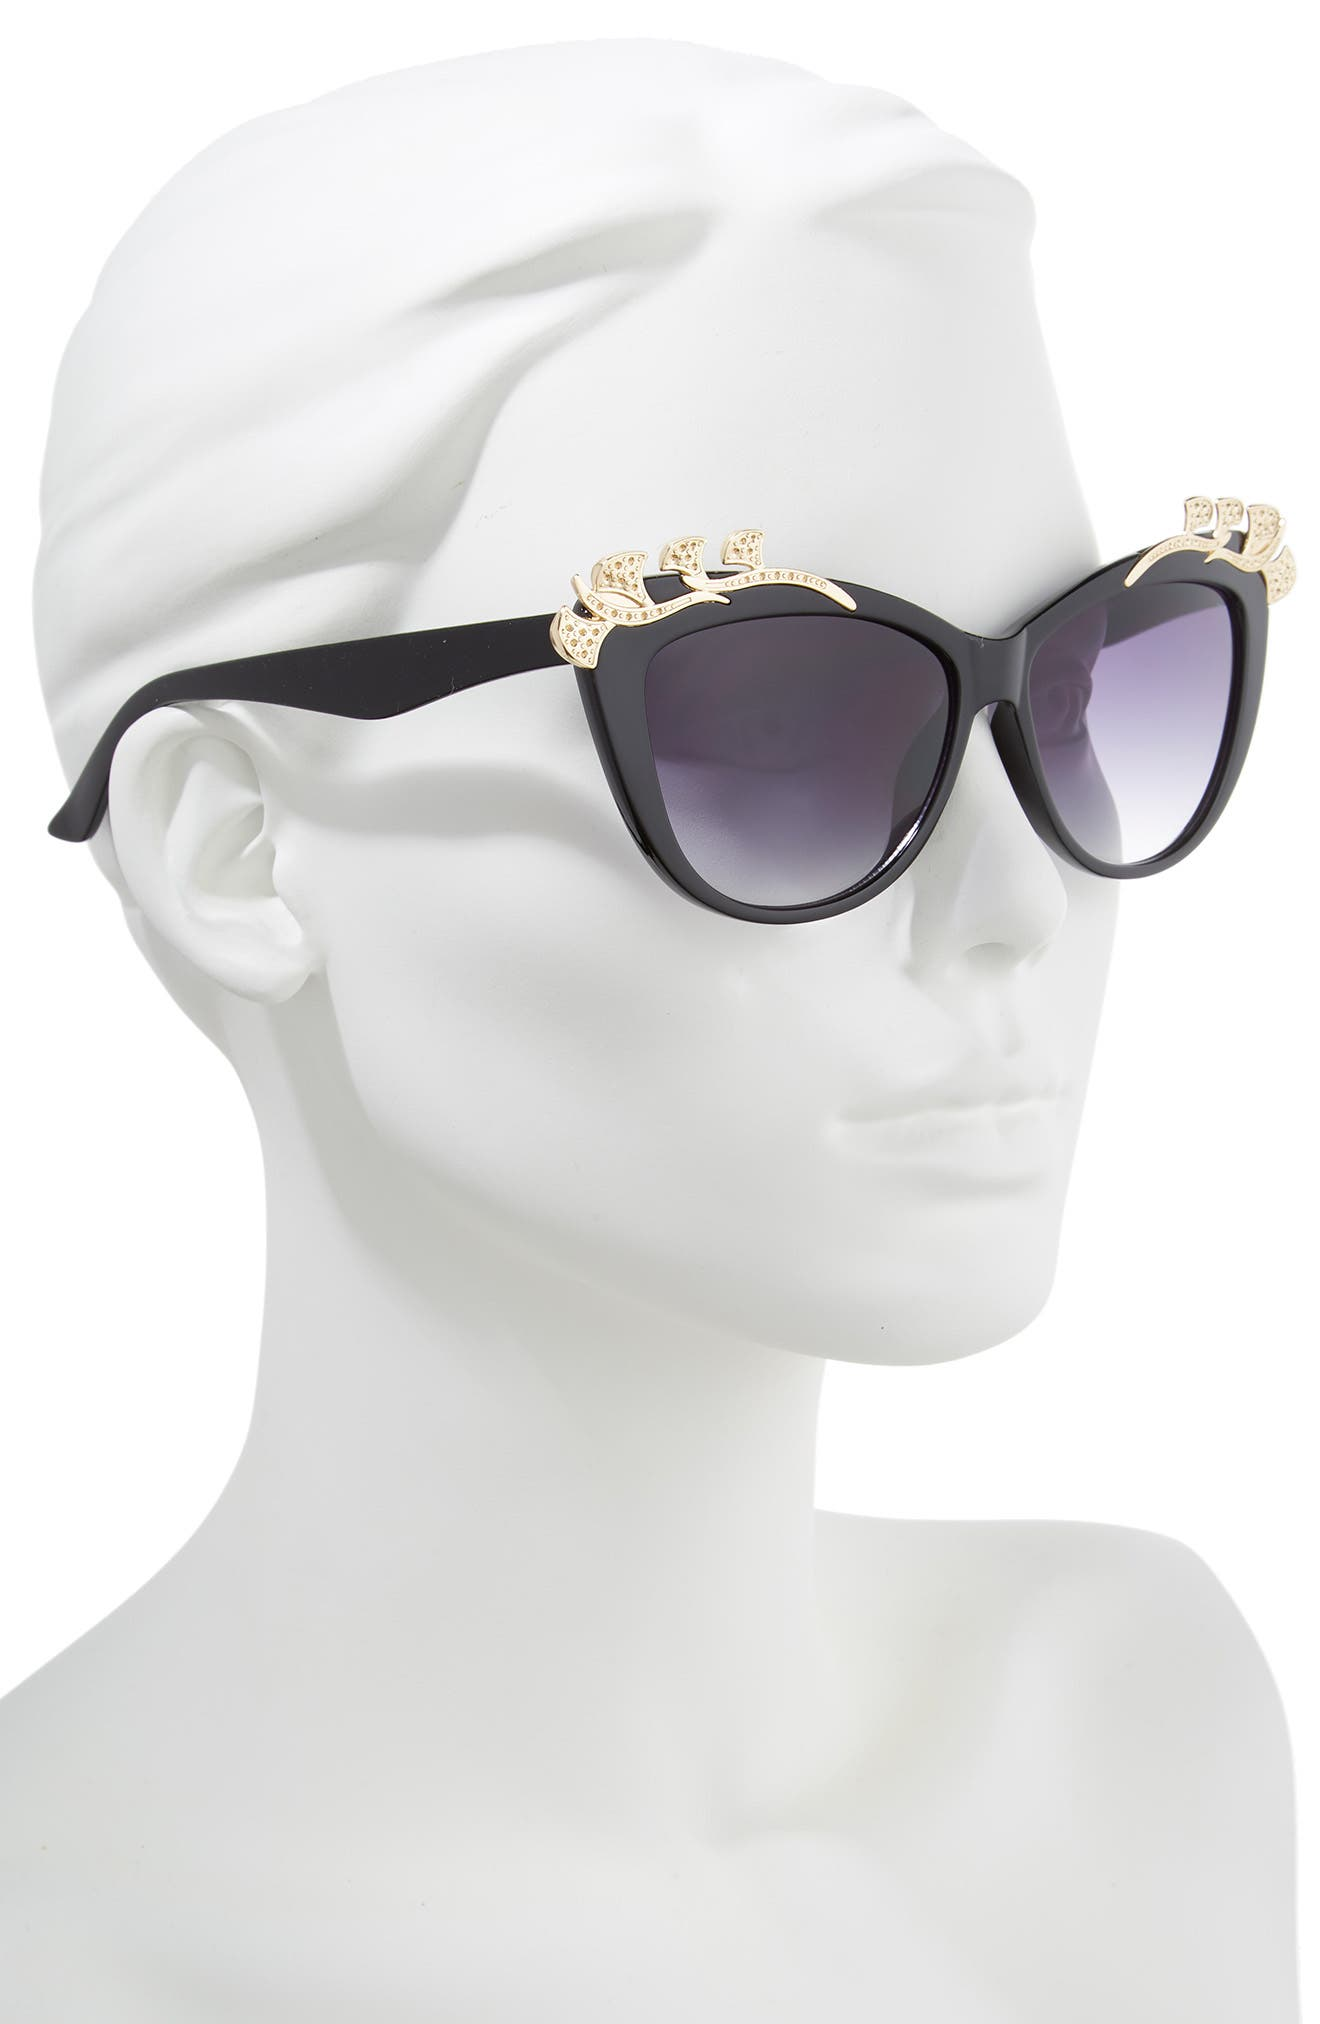 57mm Embellished Sunglasses,                             Alternate thumbnail 2, color,                             001